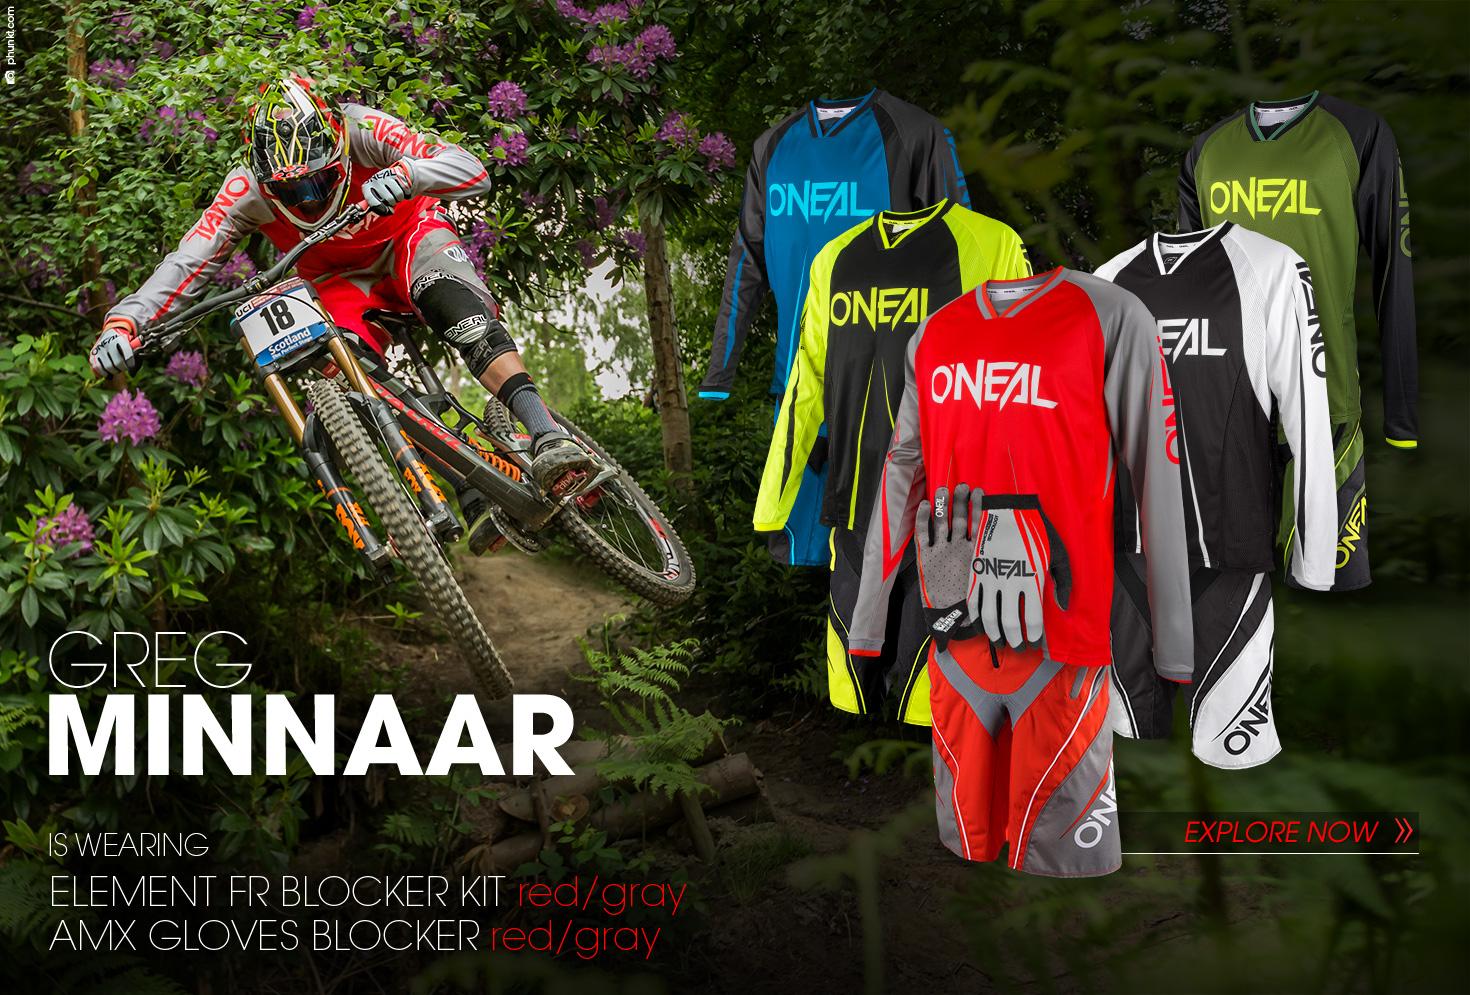 O'Neal Element FR Blocker Gear Kit - Greg Minnaar